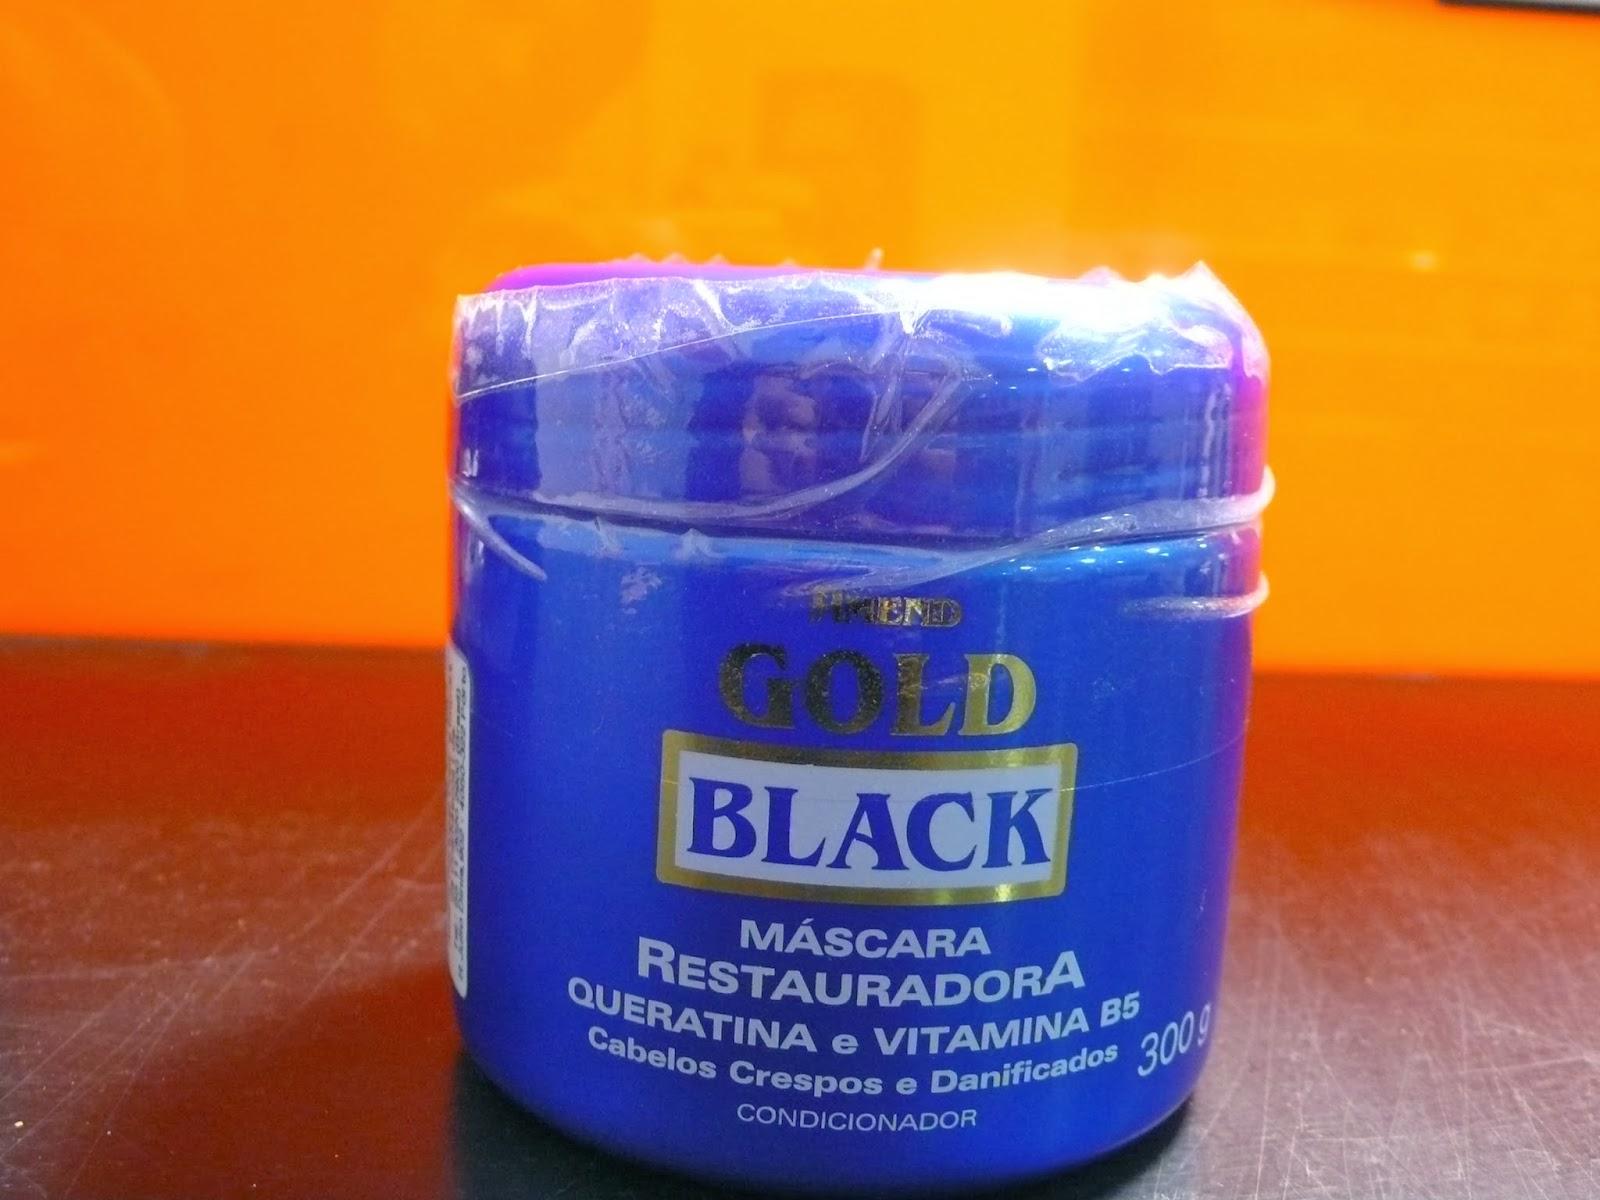 http://www.brasilybelleza.com/Amend-Mascarilla-Gold-Black-Restauradora-Queratina-y-Vitamina-B5